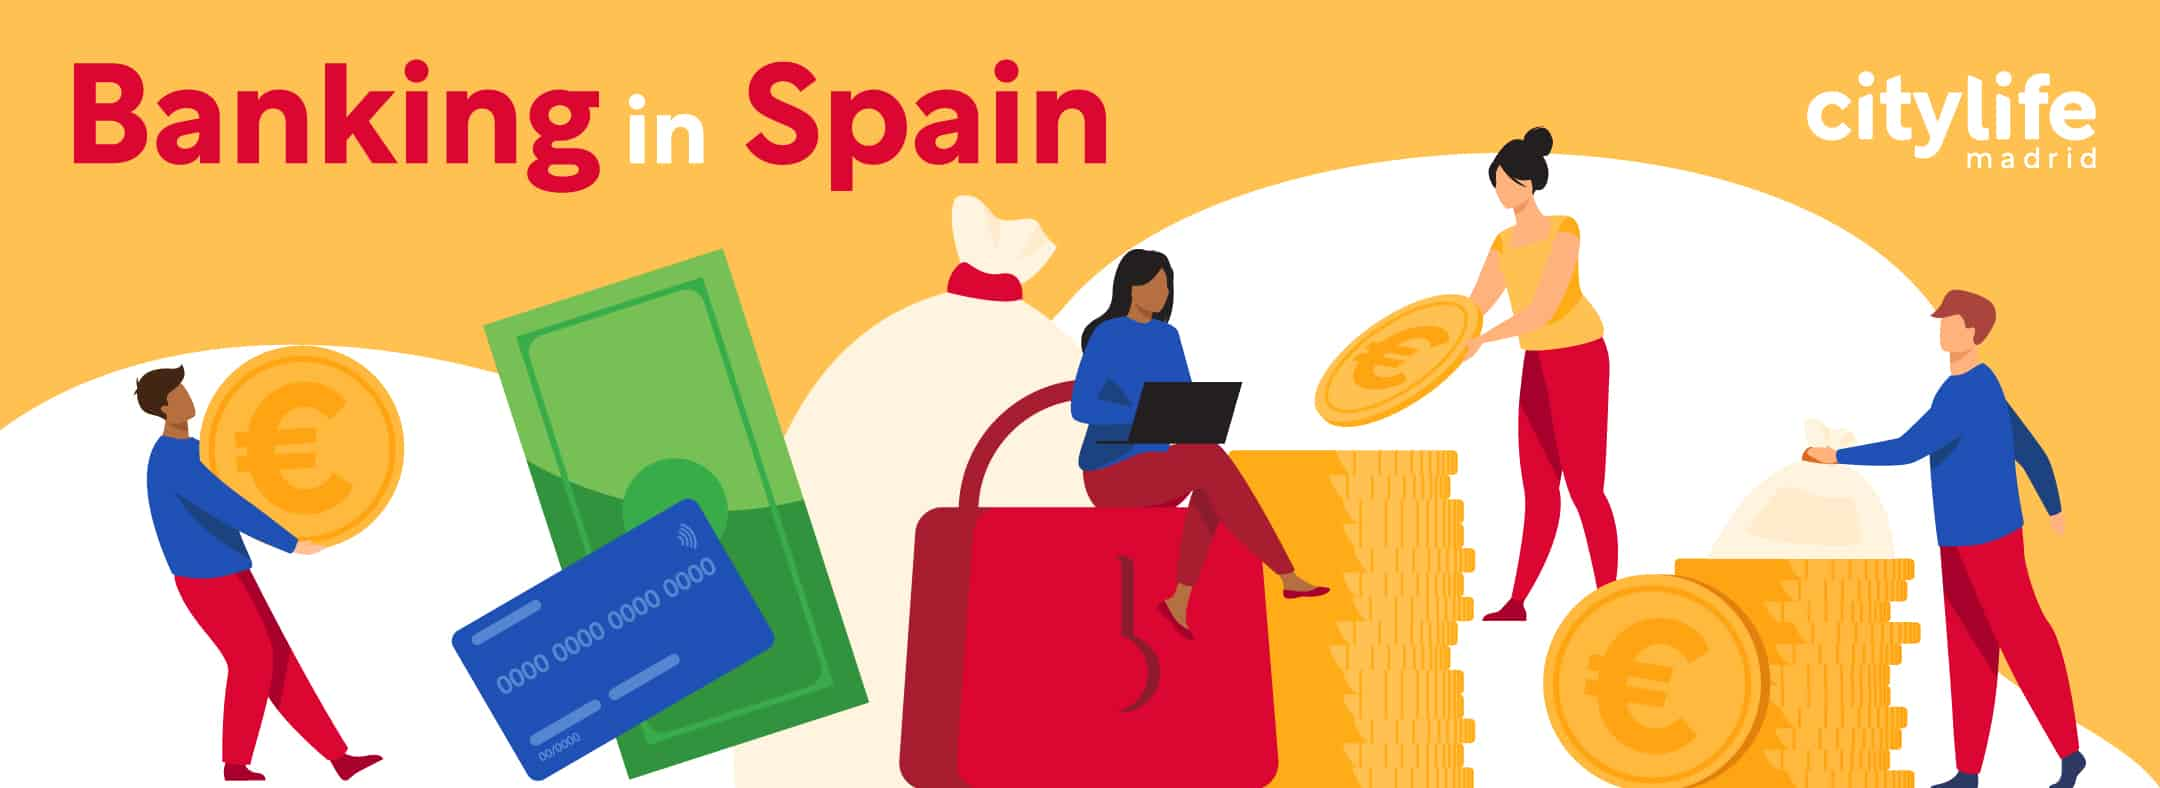 citylife-madrid-banking-spain-web-banner